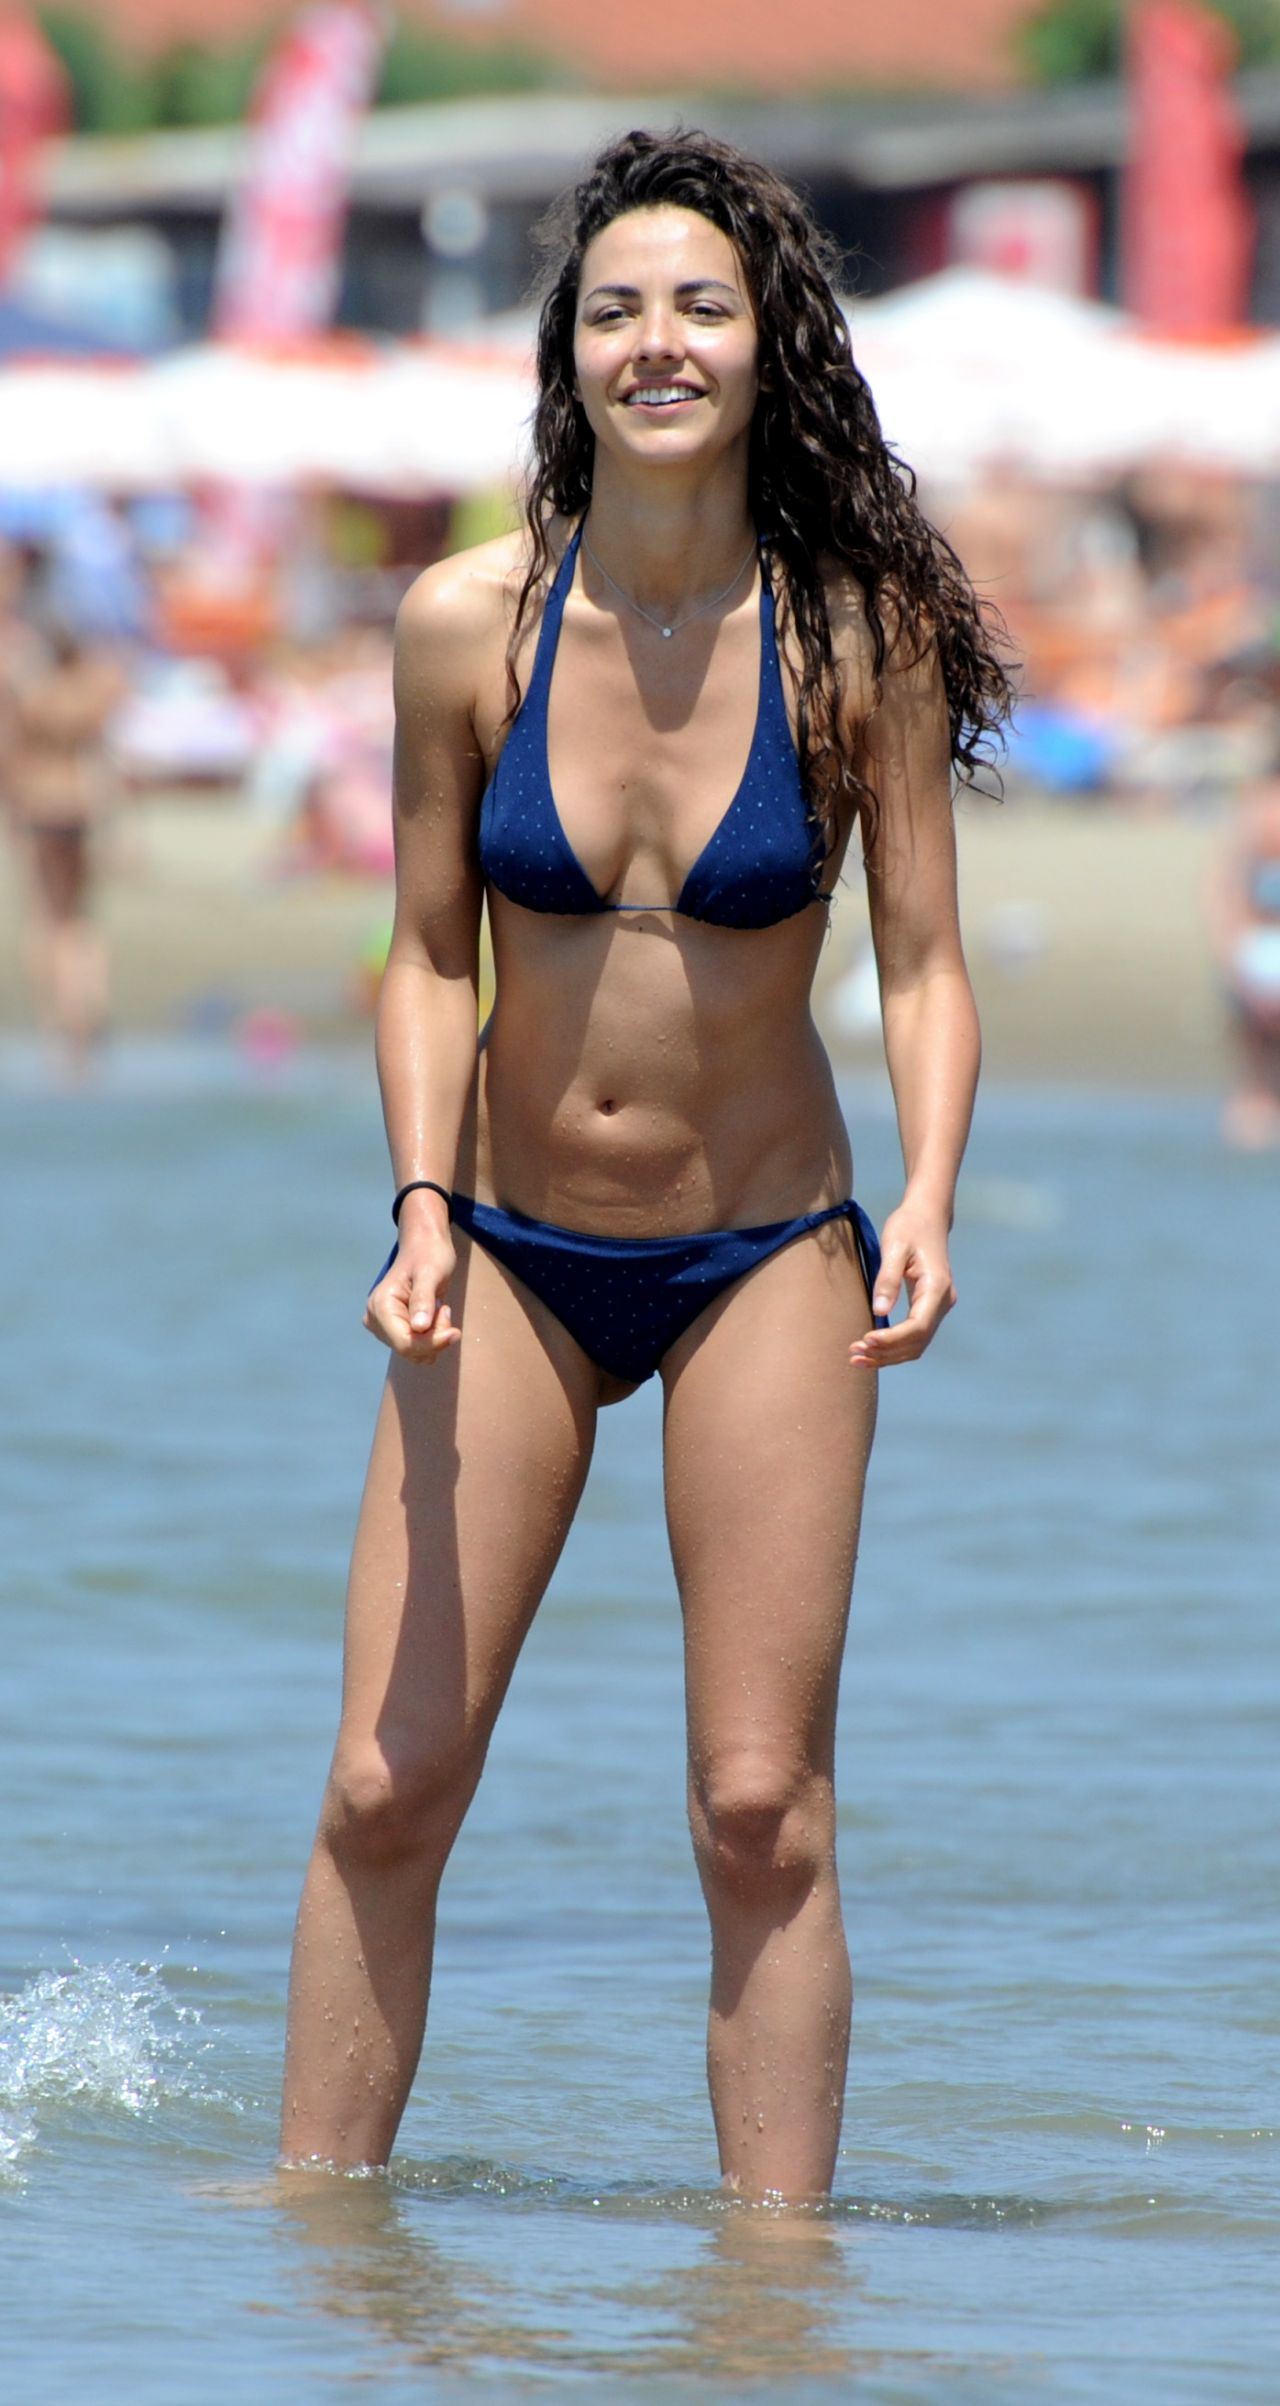 Laura June On 2014 Barriales Beach A The In Bikini Yby7gf6